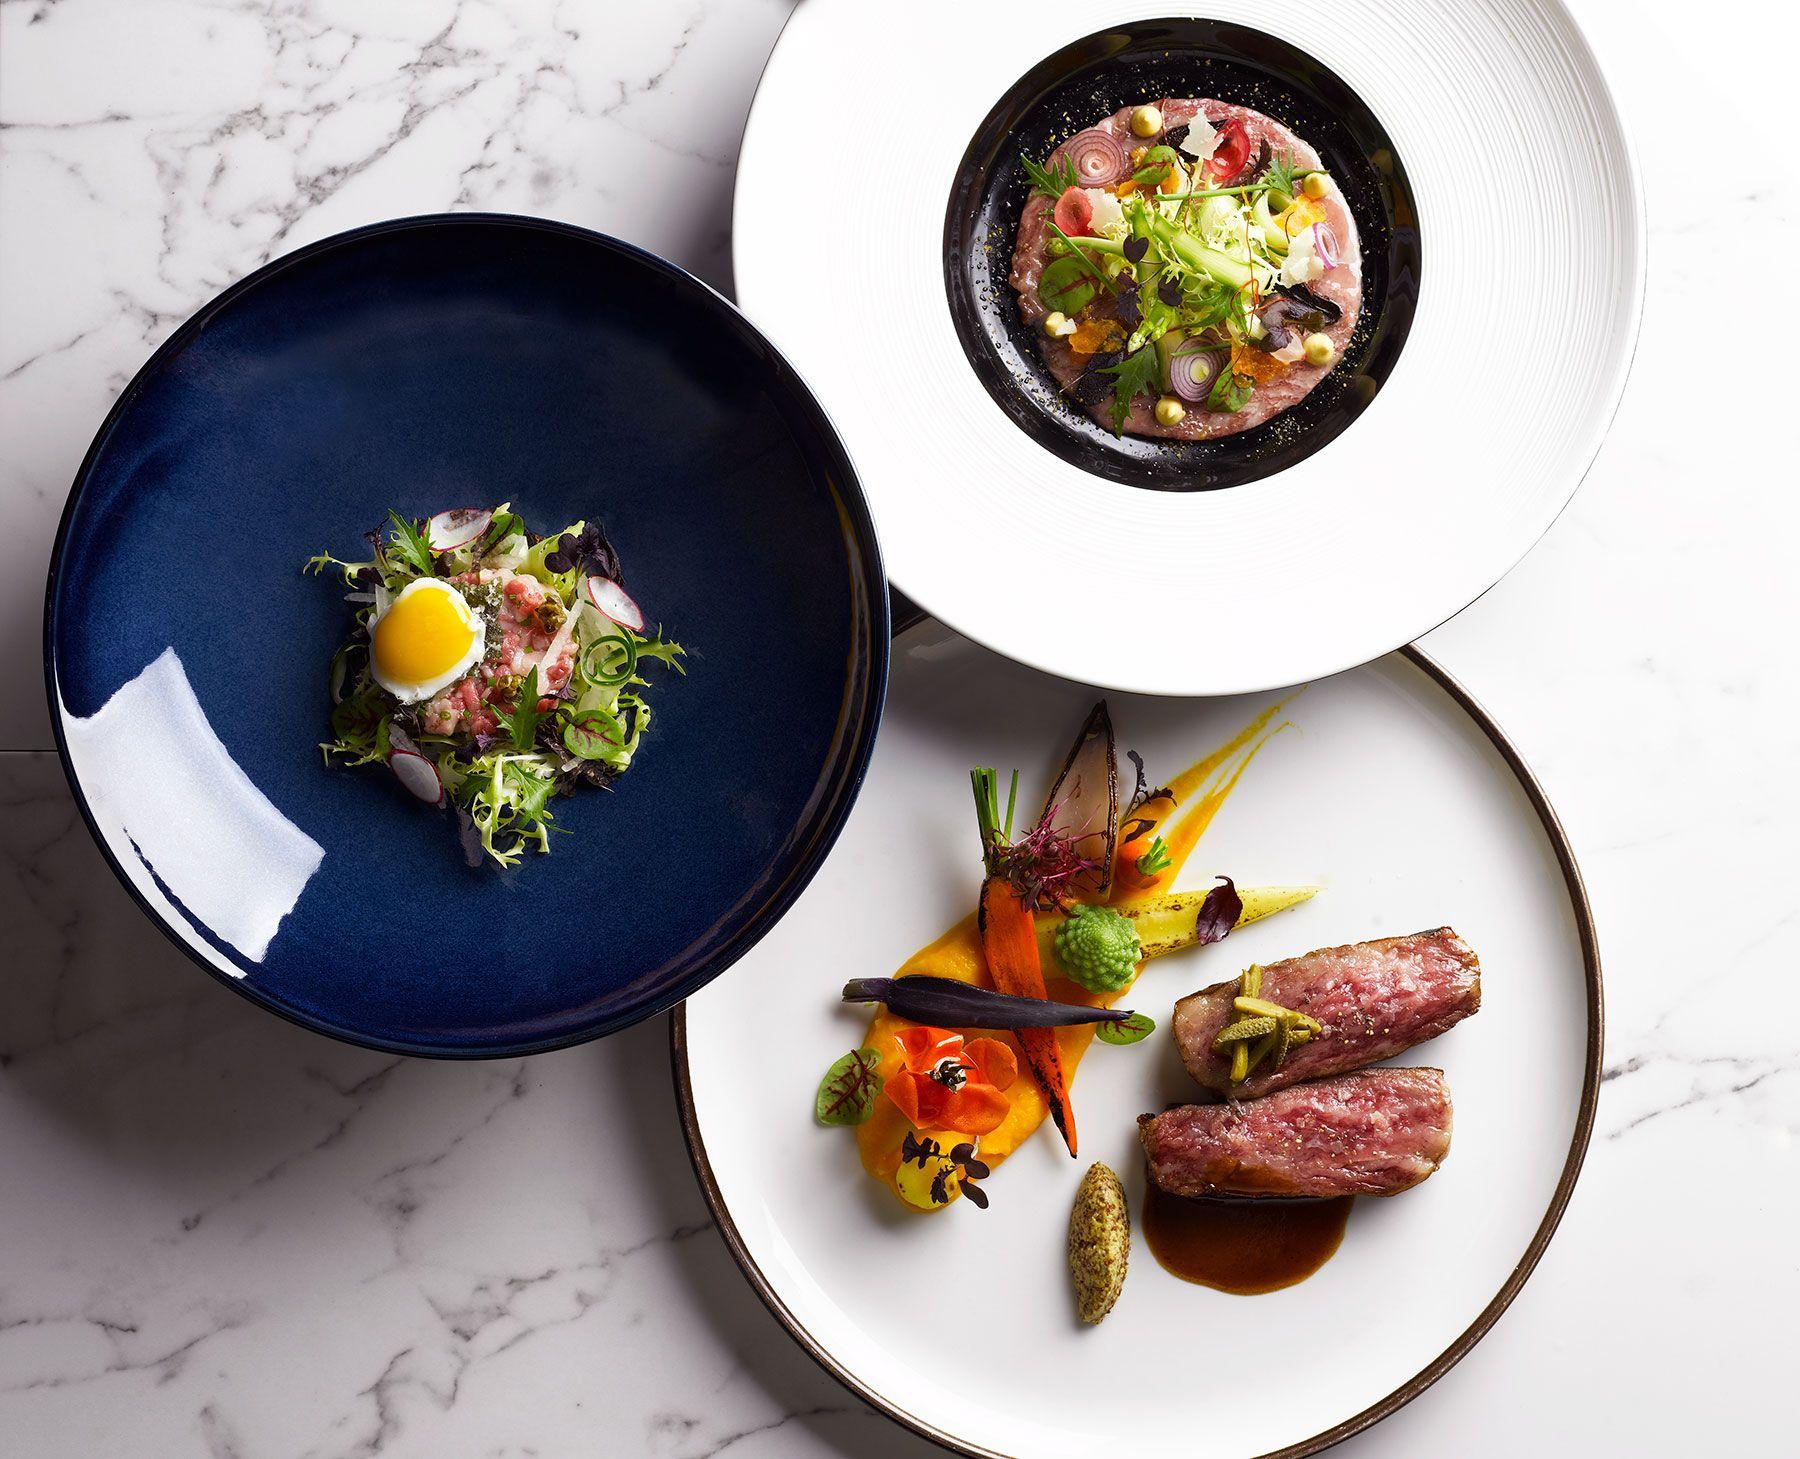 Where To Eat This Week: Fat Cow, La Brasserie, Basque Kitchen by Aitor, Neon Pigeon, Verde Kitchen